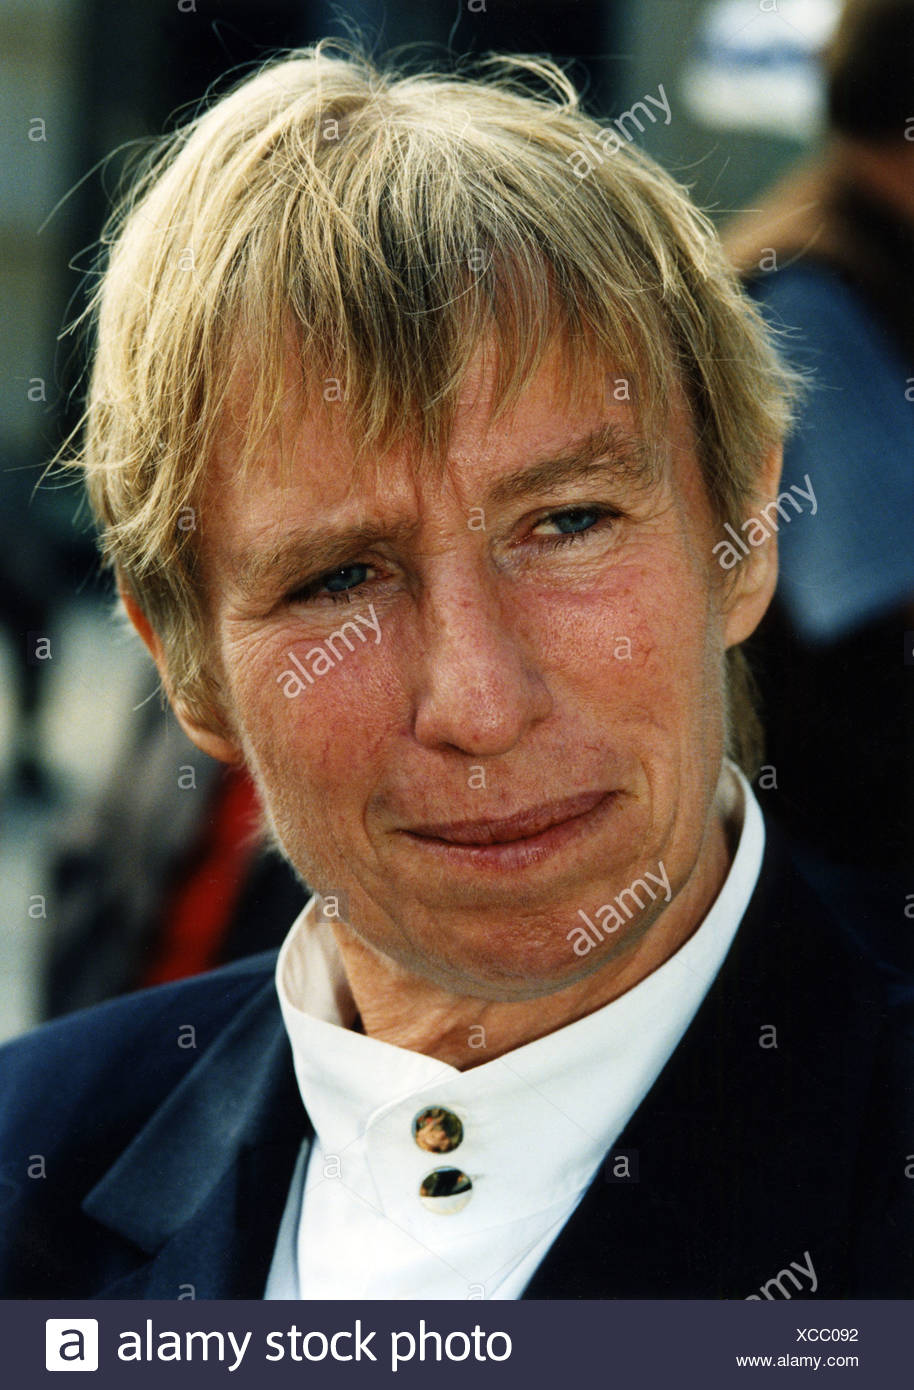 Hildebrandt, Regine, 26.4.1941 - 26.11.2001, German politician (SPD), labour minister (1990), portrait, 1999, Additional-Rights-Clearances-NA Stock Photo